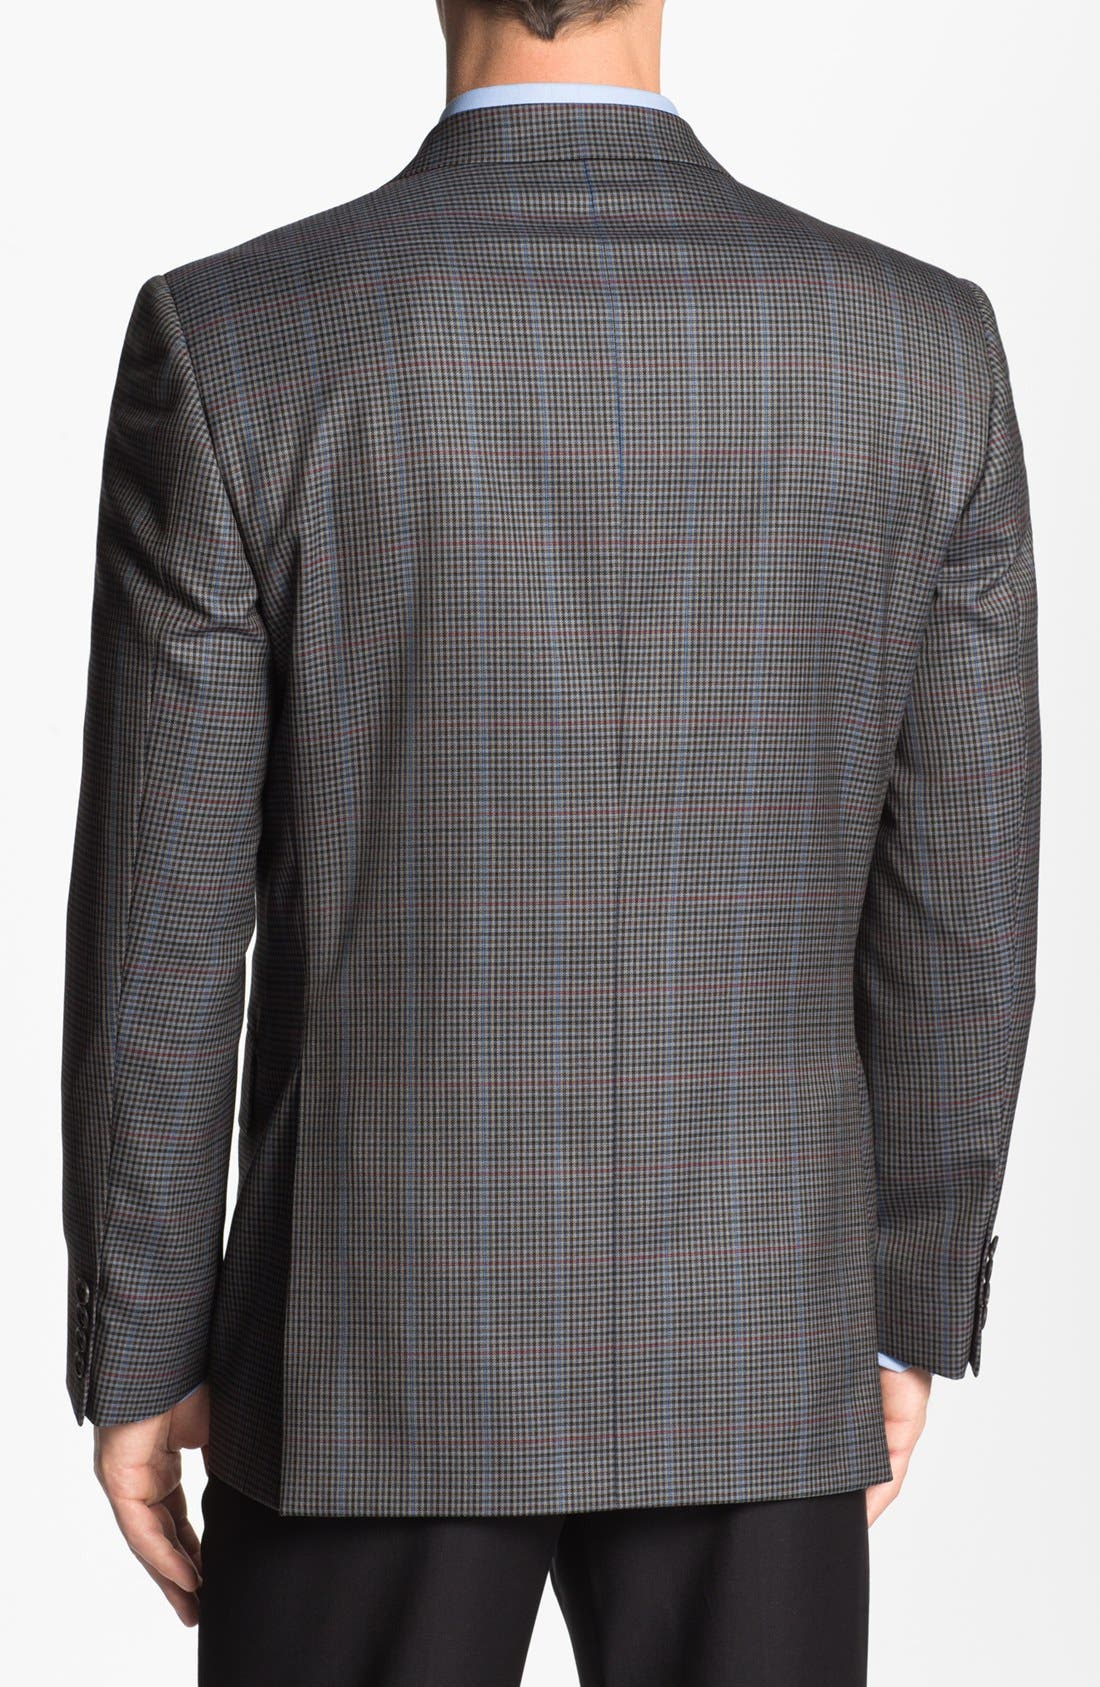 Alternate Image 3  - Joseph Abboud 'Signature Silver' Check Wool Sportcoat